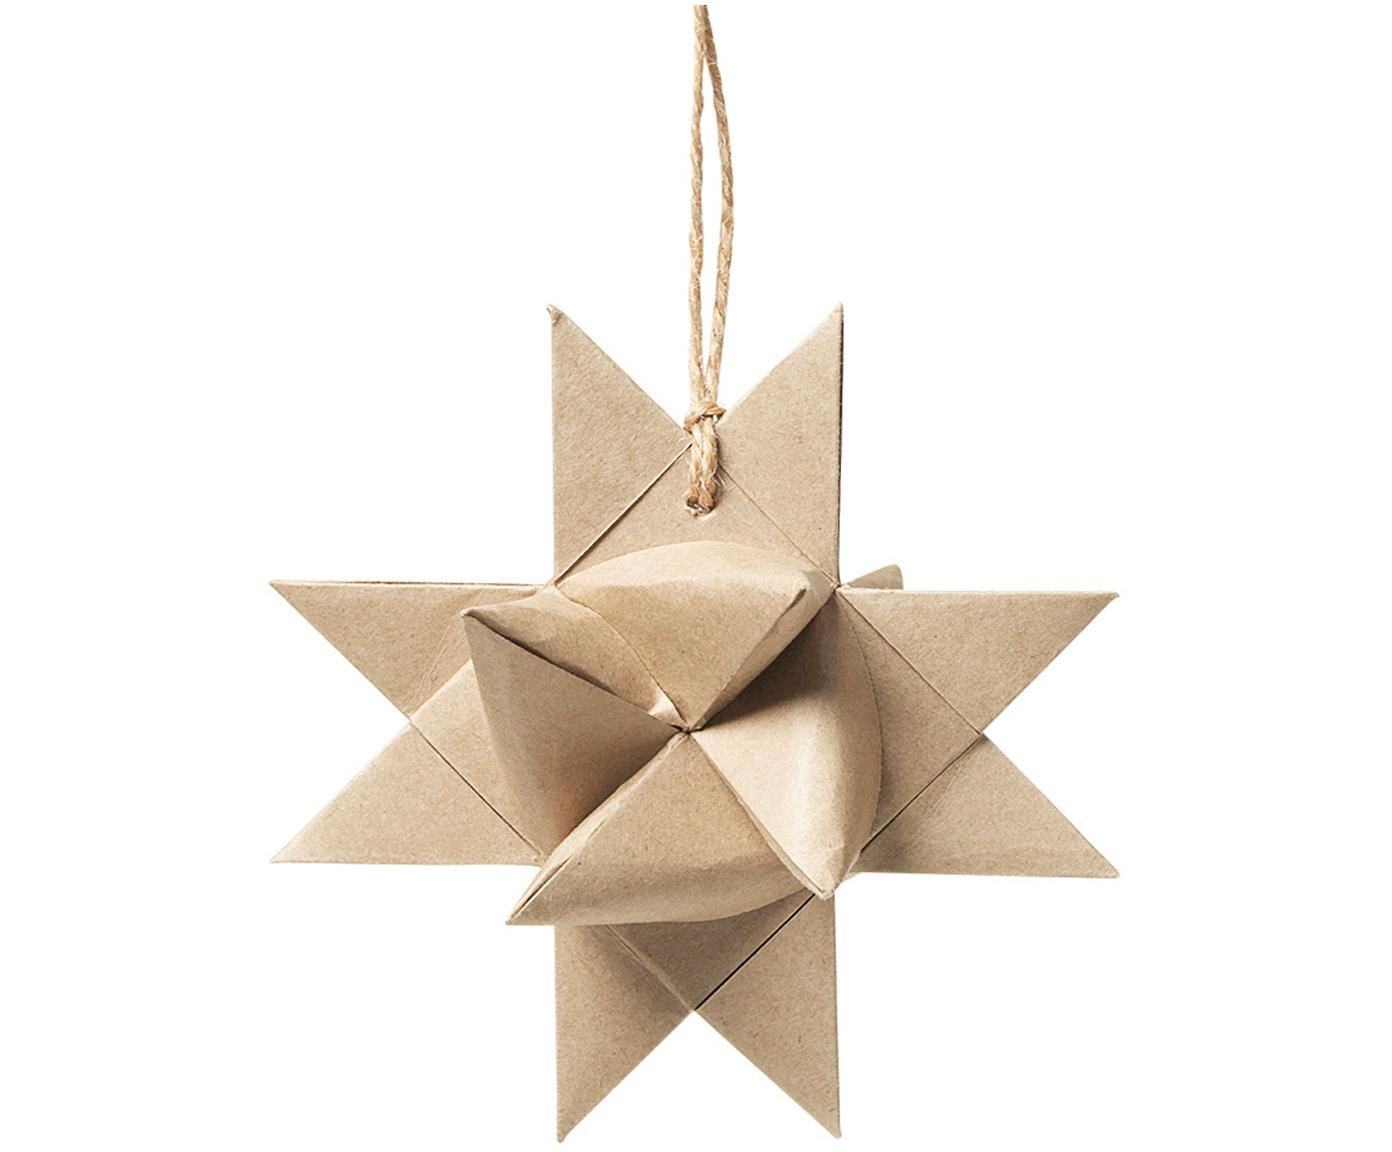 Ciondolo Star Origami 4 pz, Carta, Beige, Larg. 11 x Prof. 11 cm